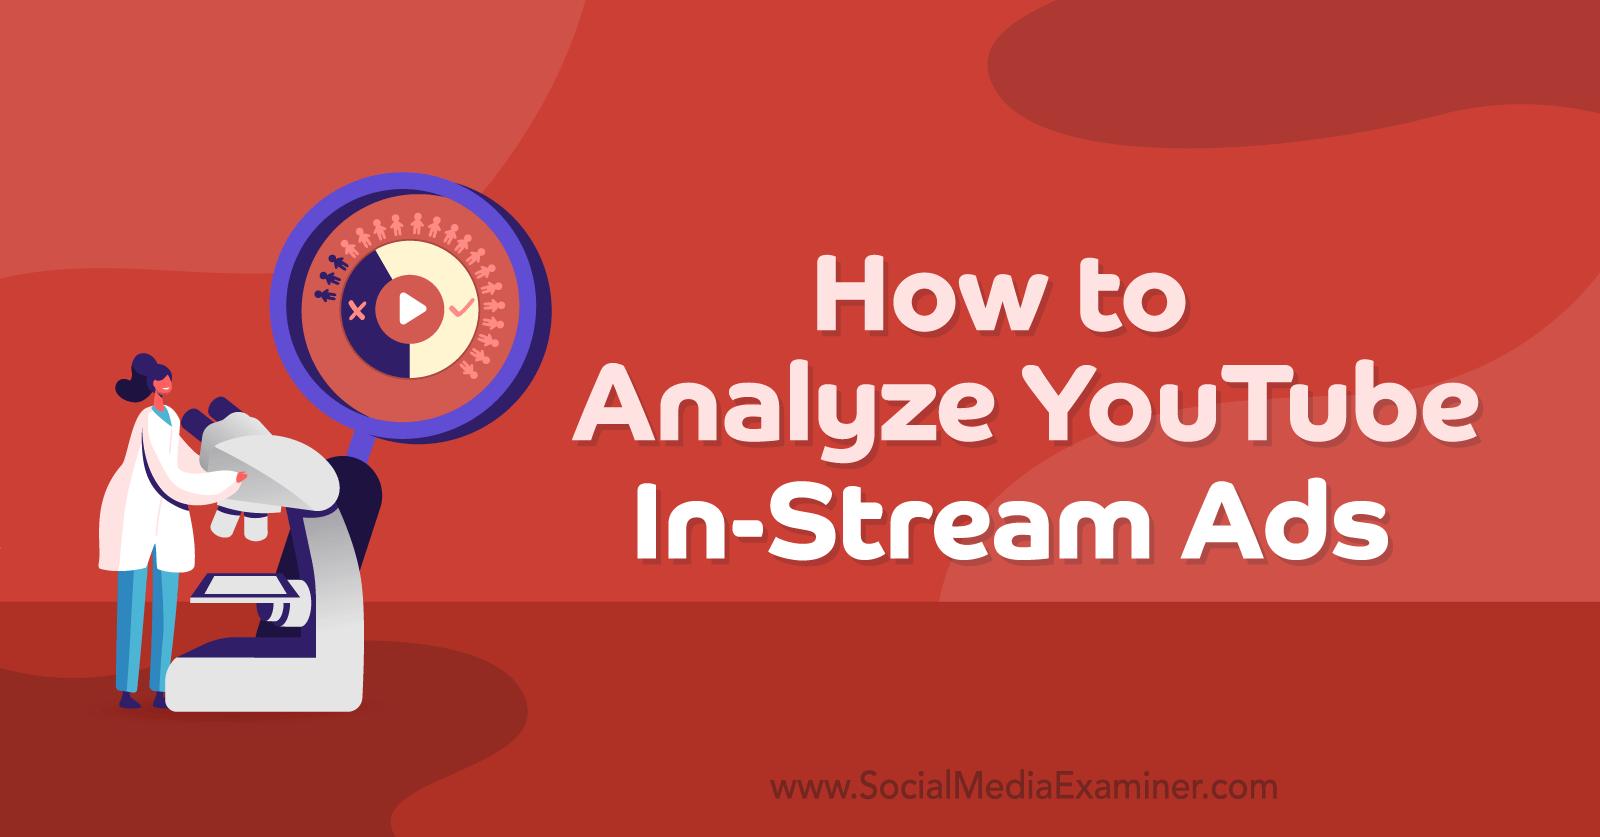 How to Analyze YouTube In-Stream Ads by Joe Martinez on Social Media Examiner.